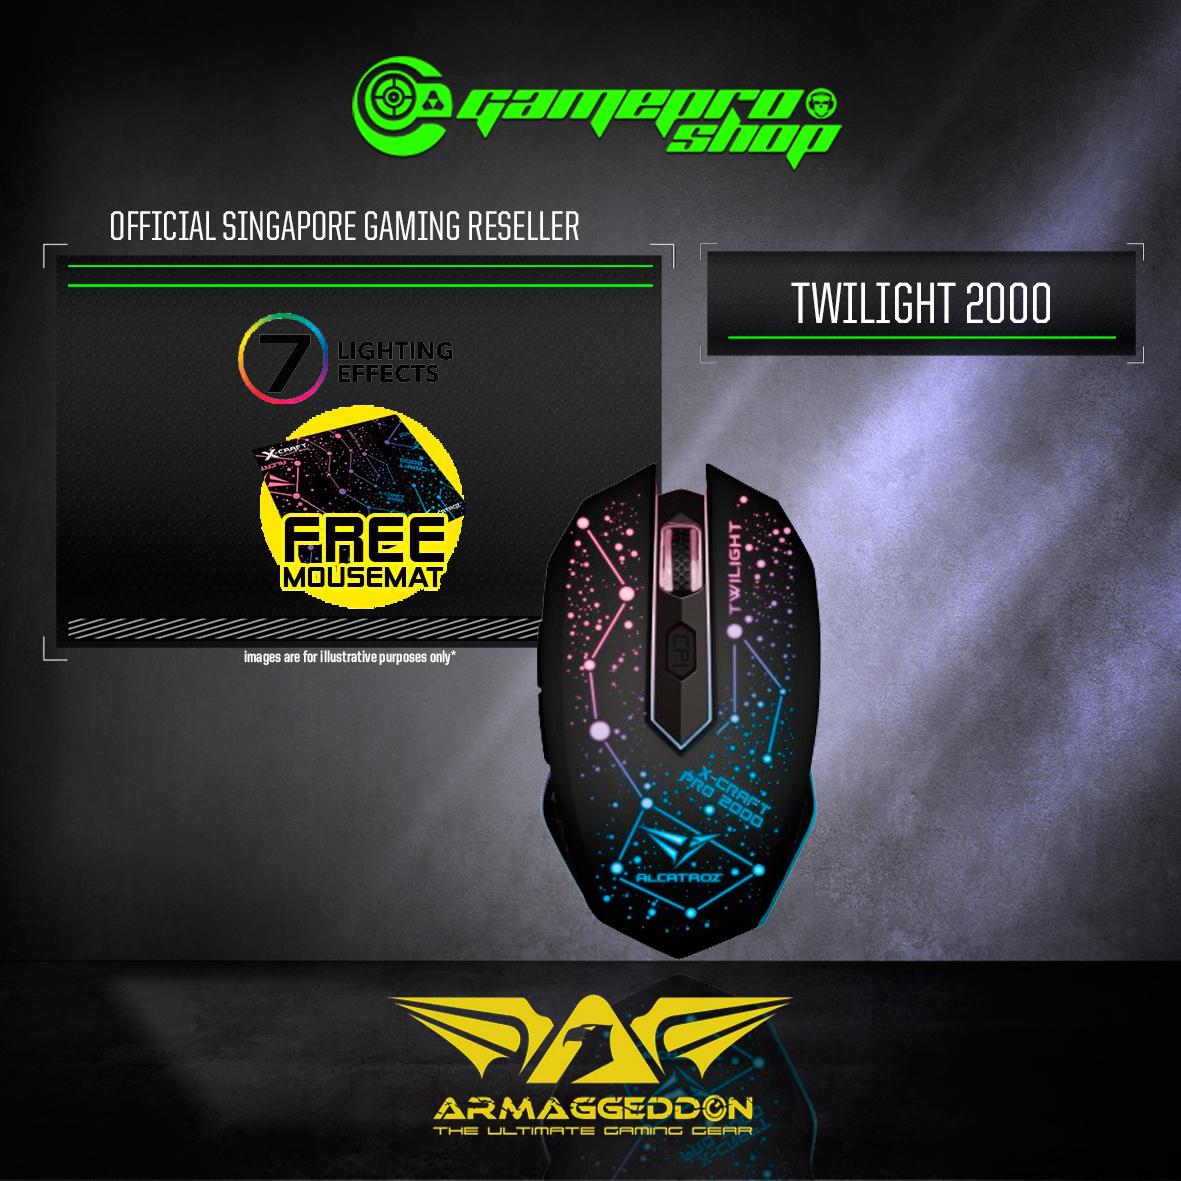 Armaggeddon X-Craft Pro Twilight 2000 Gaming Mouse